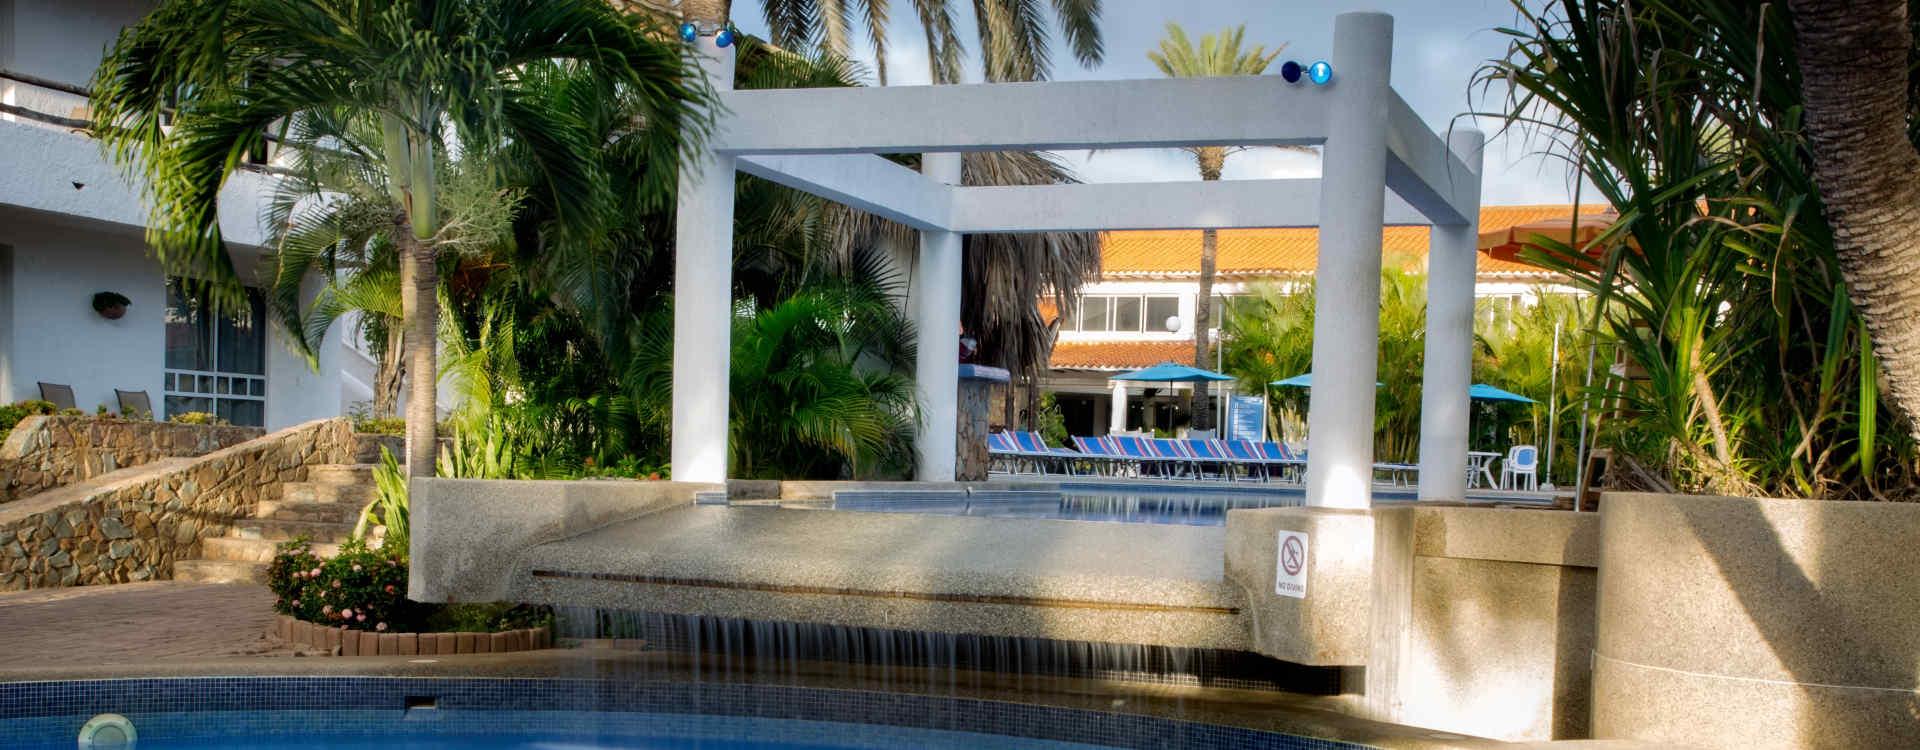 Hotel Palm Beach Area Piscina